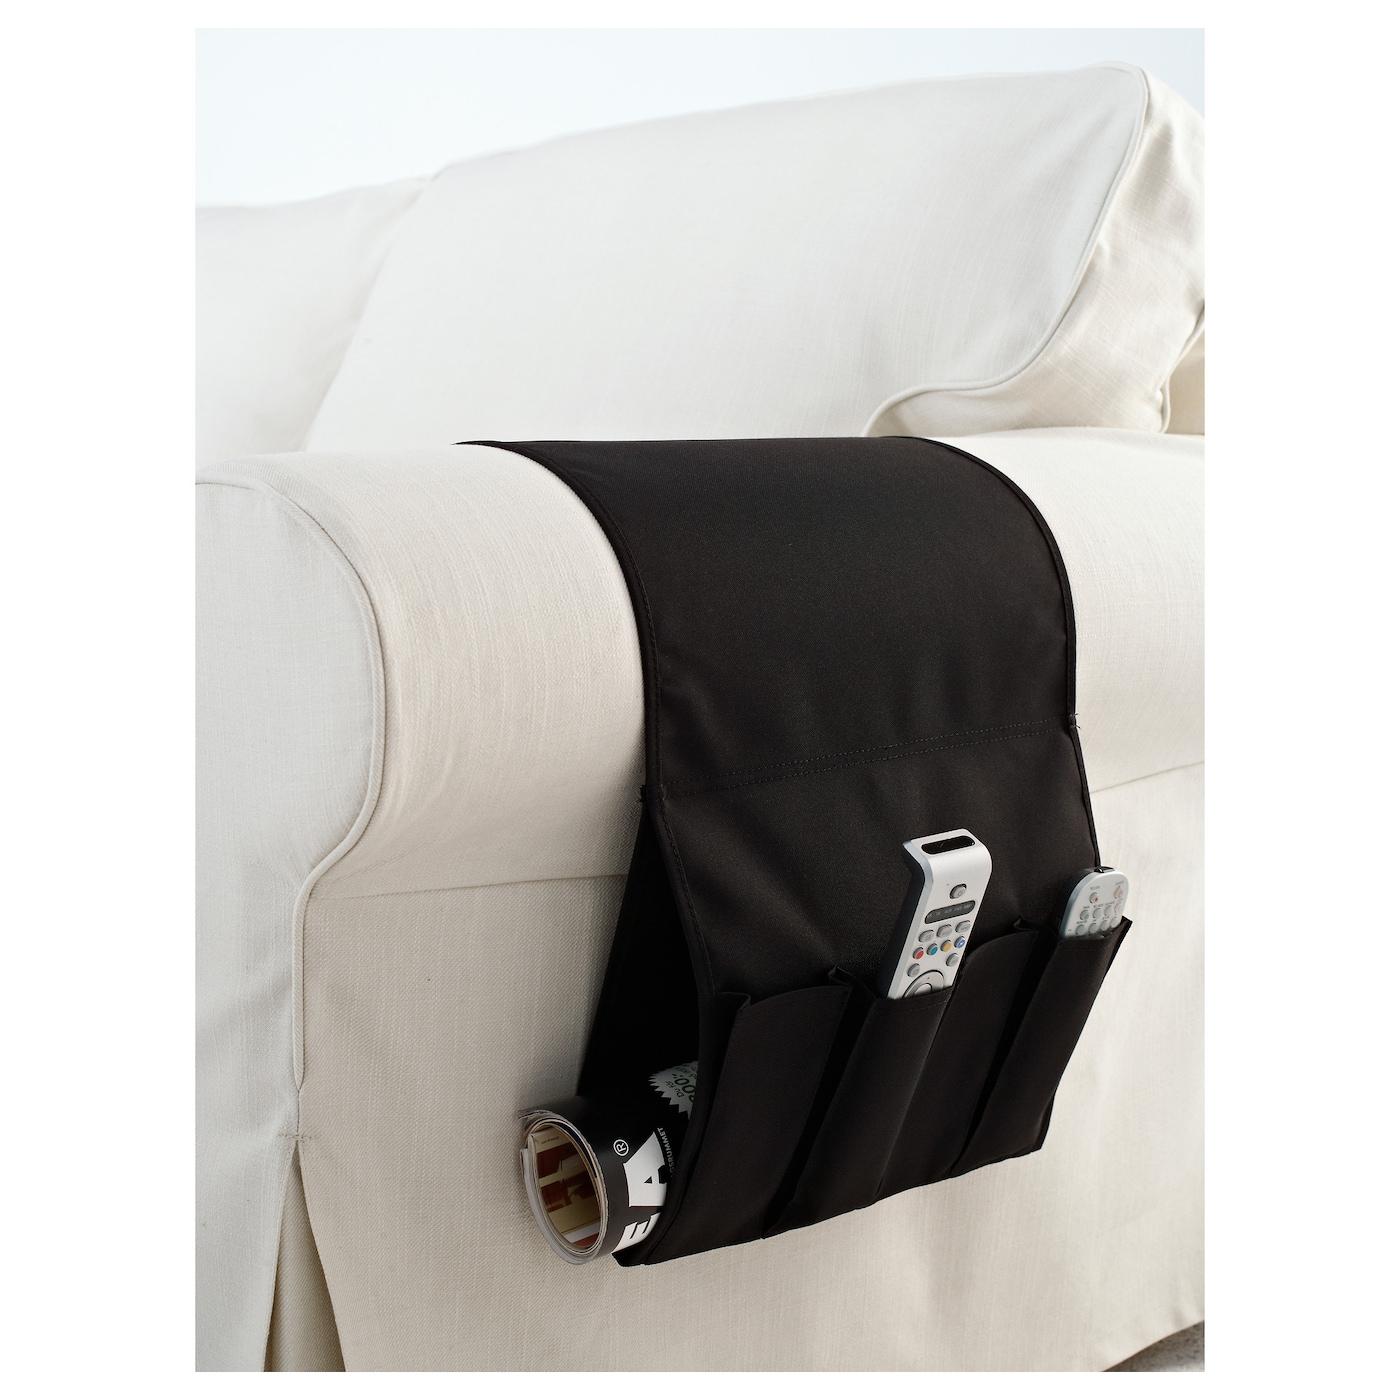 FLÖRT Remote control pocket Black - IKEA